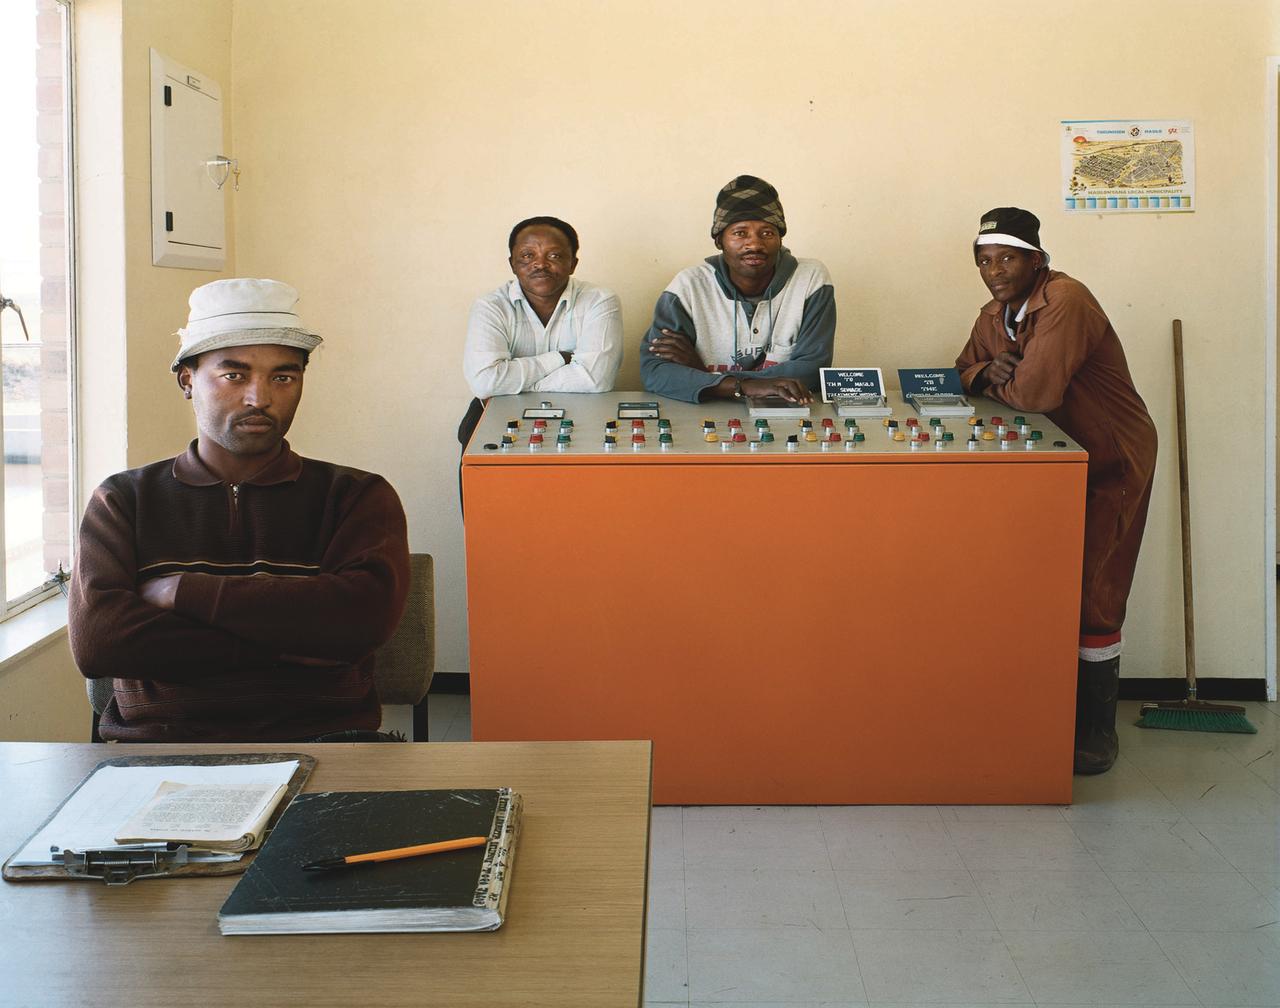 Seliane Vincent, Jonas Togo, Piet Jacobs, Albert Lekauta, operators of the sewage-treatment plant, Theunissen, Free State. 11 August 2004 ((c) 2014 David Goldblatt)